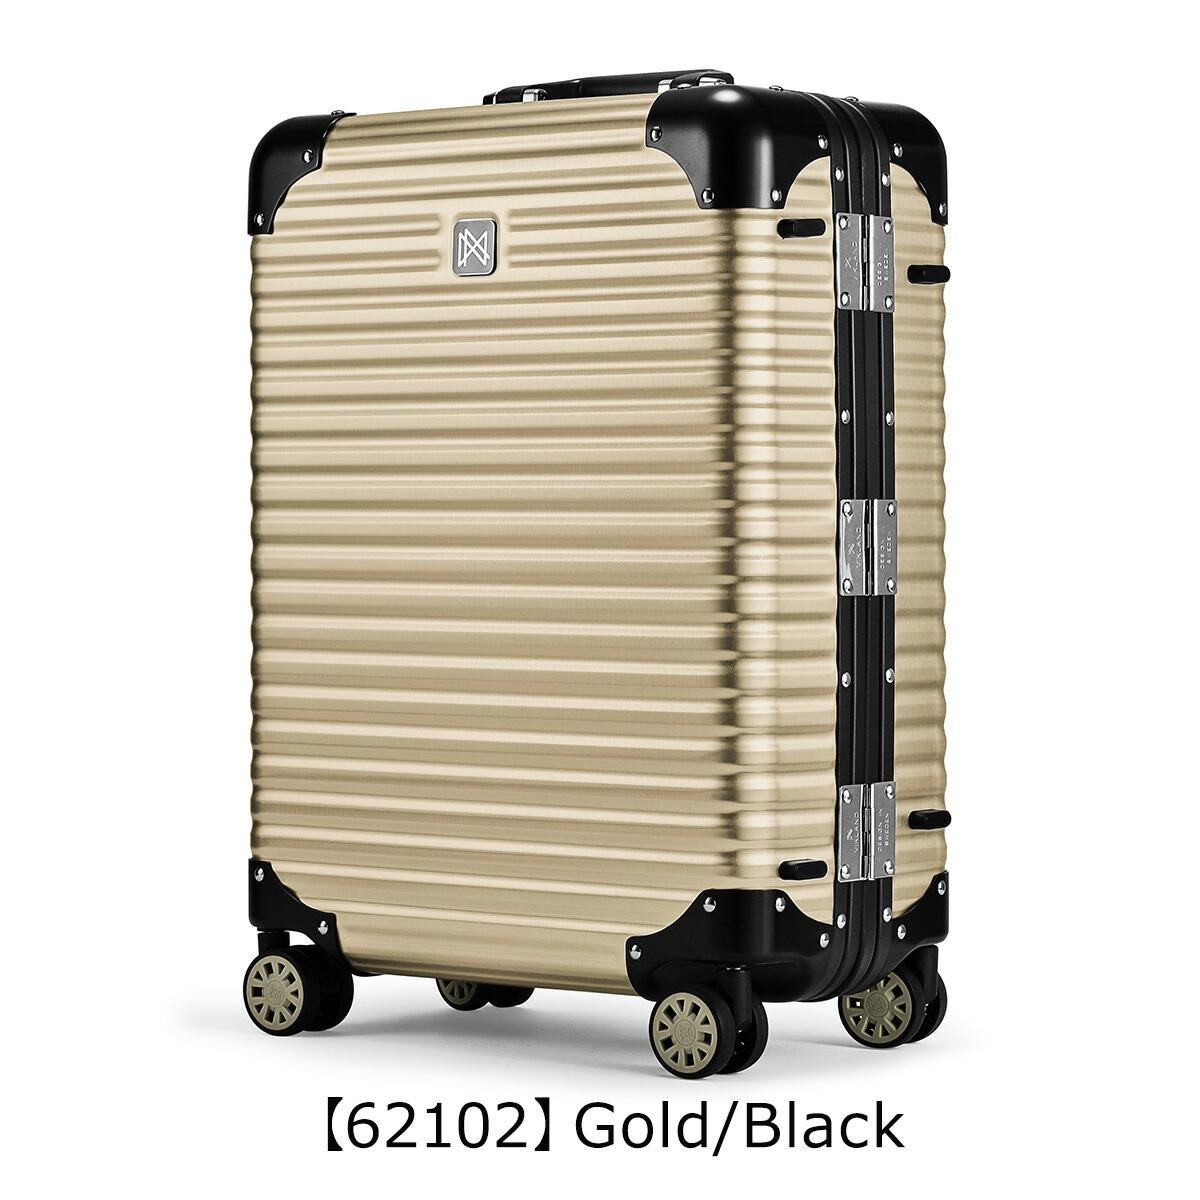 【62102】Gold/Black